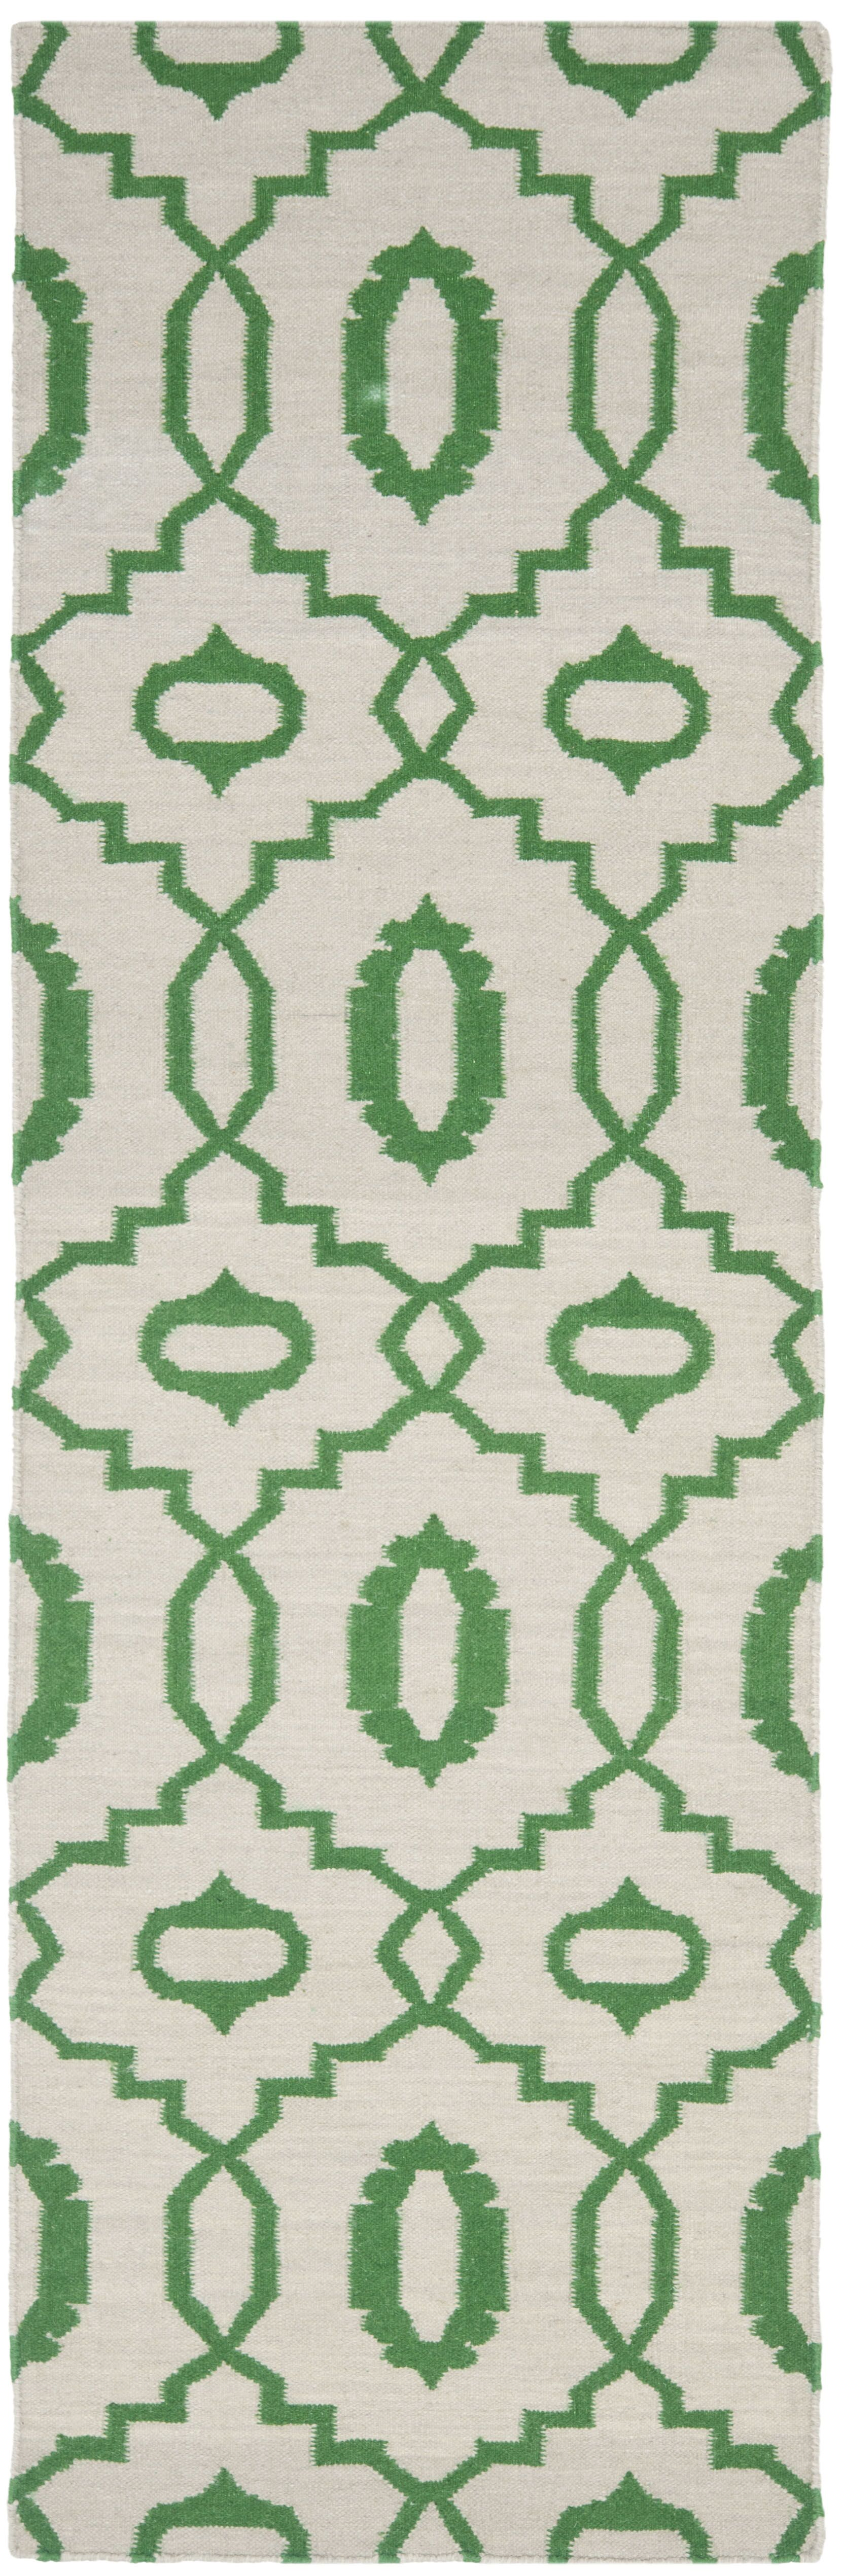 Dhurries Ivory/Green Area Rug Rug Size: Runner 2'6